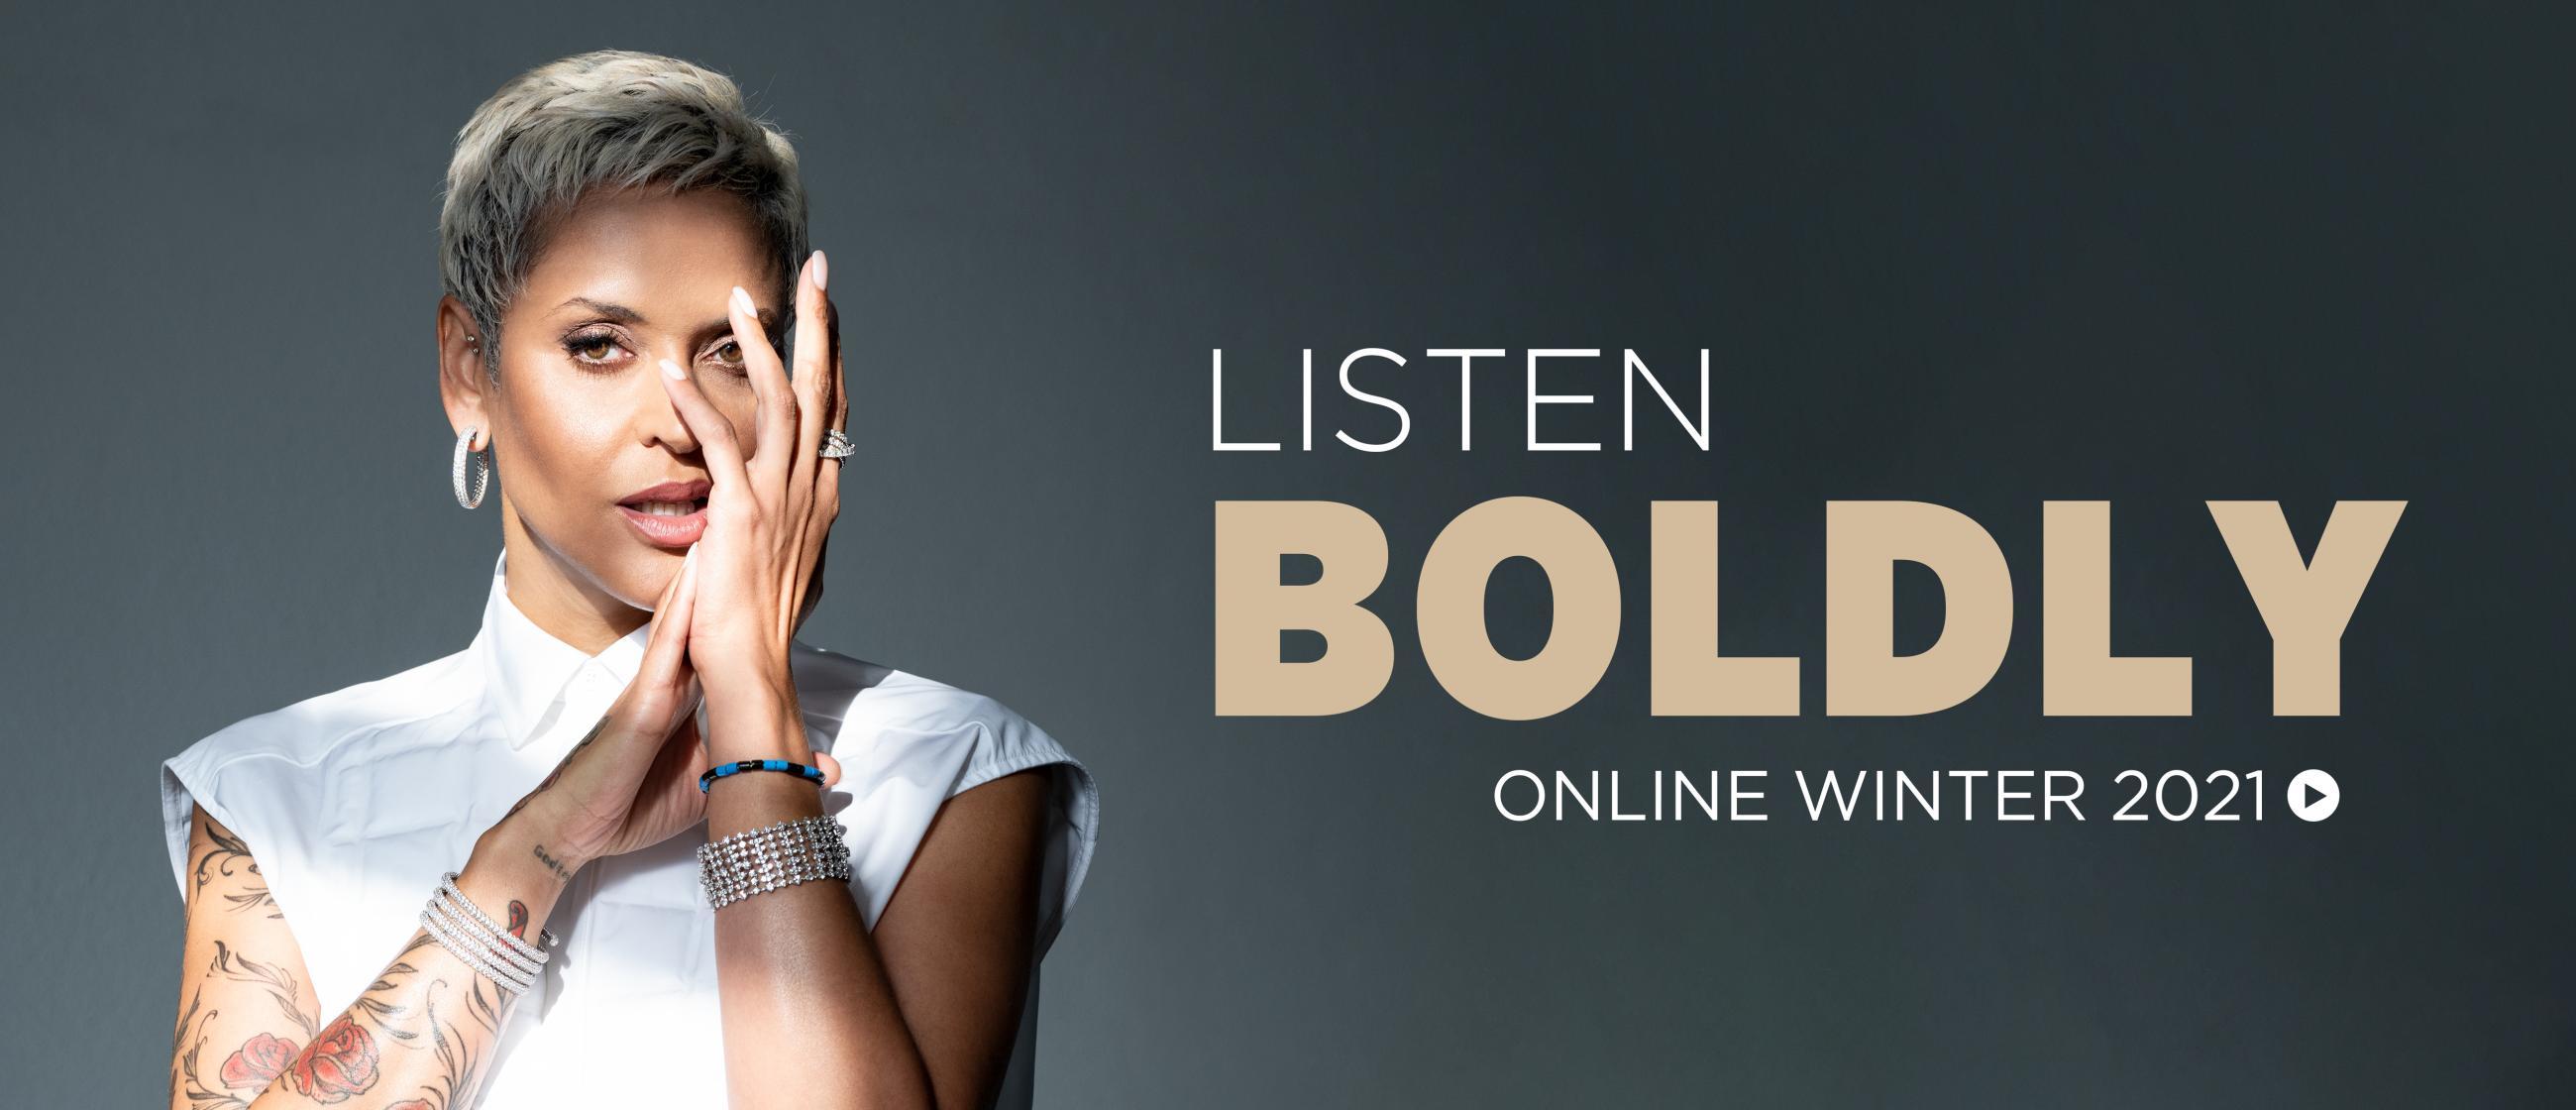 Mariza Nunes; text reads Listen Boldly Online Winter 2021